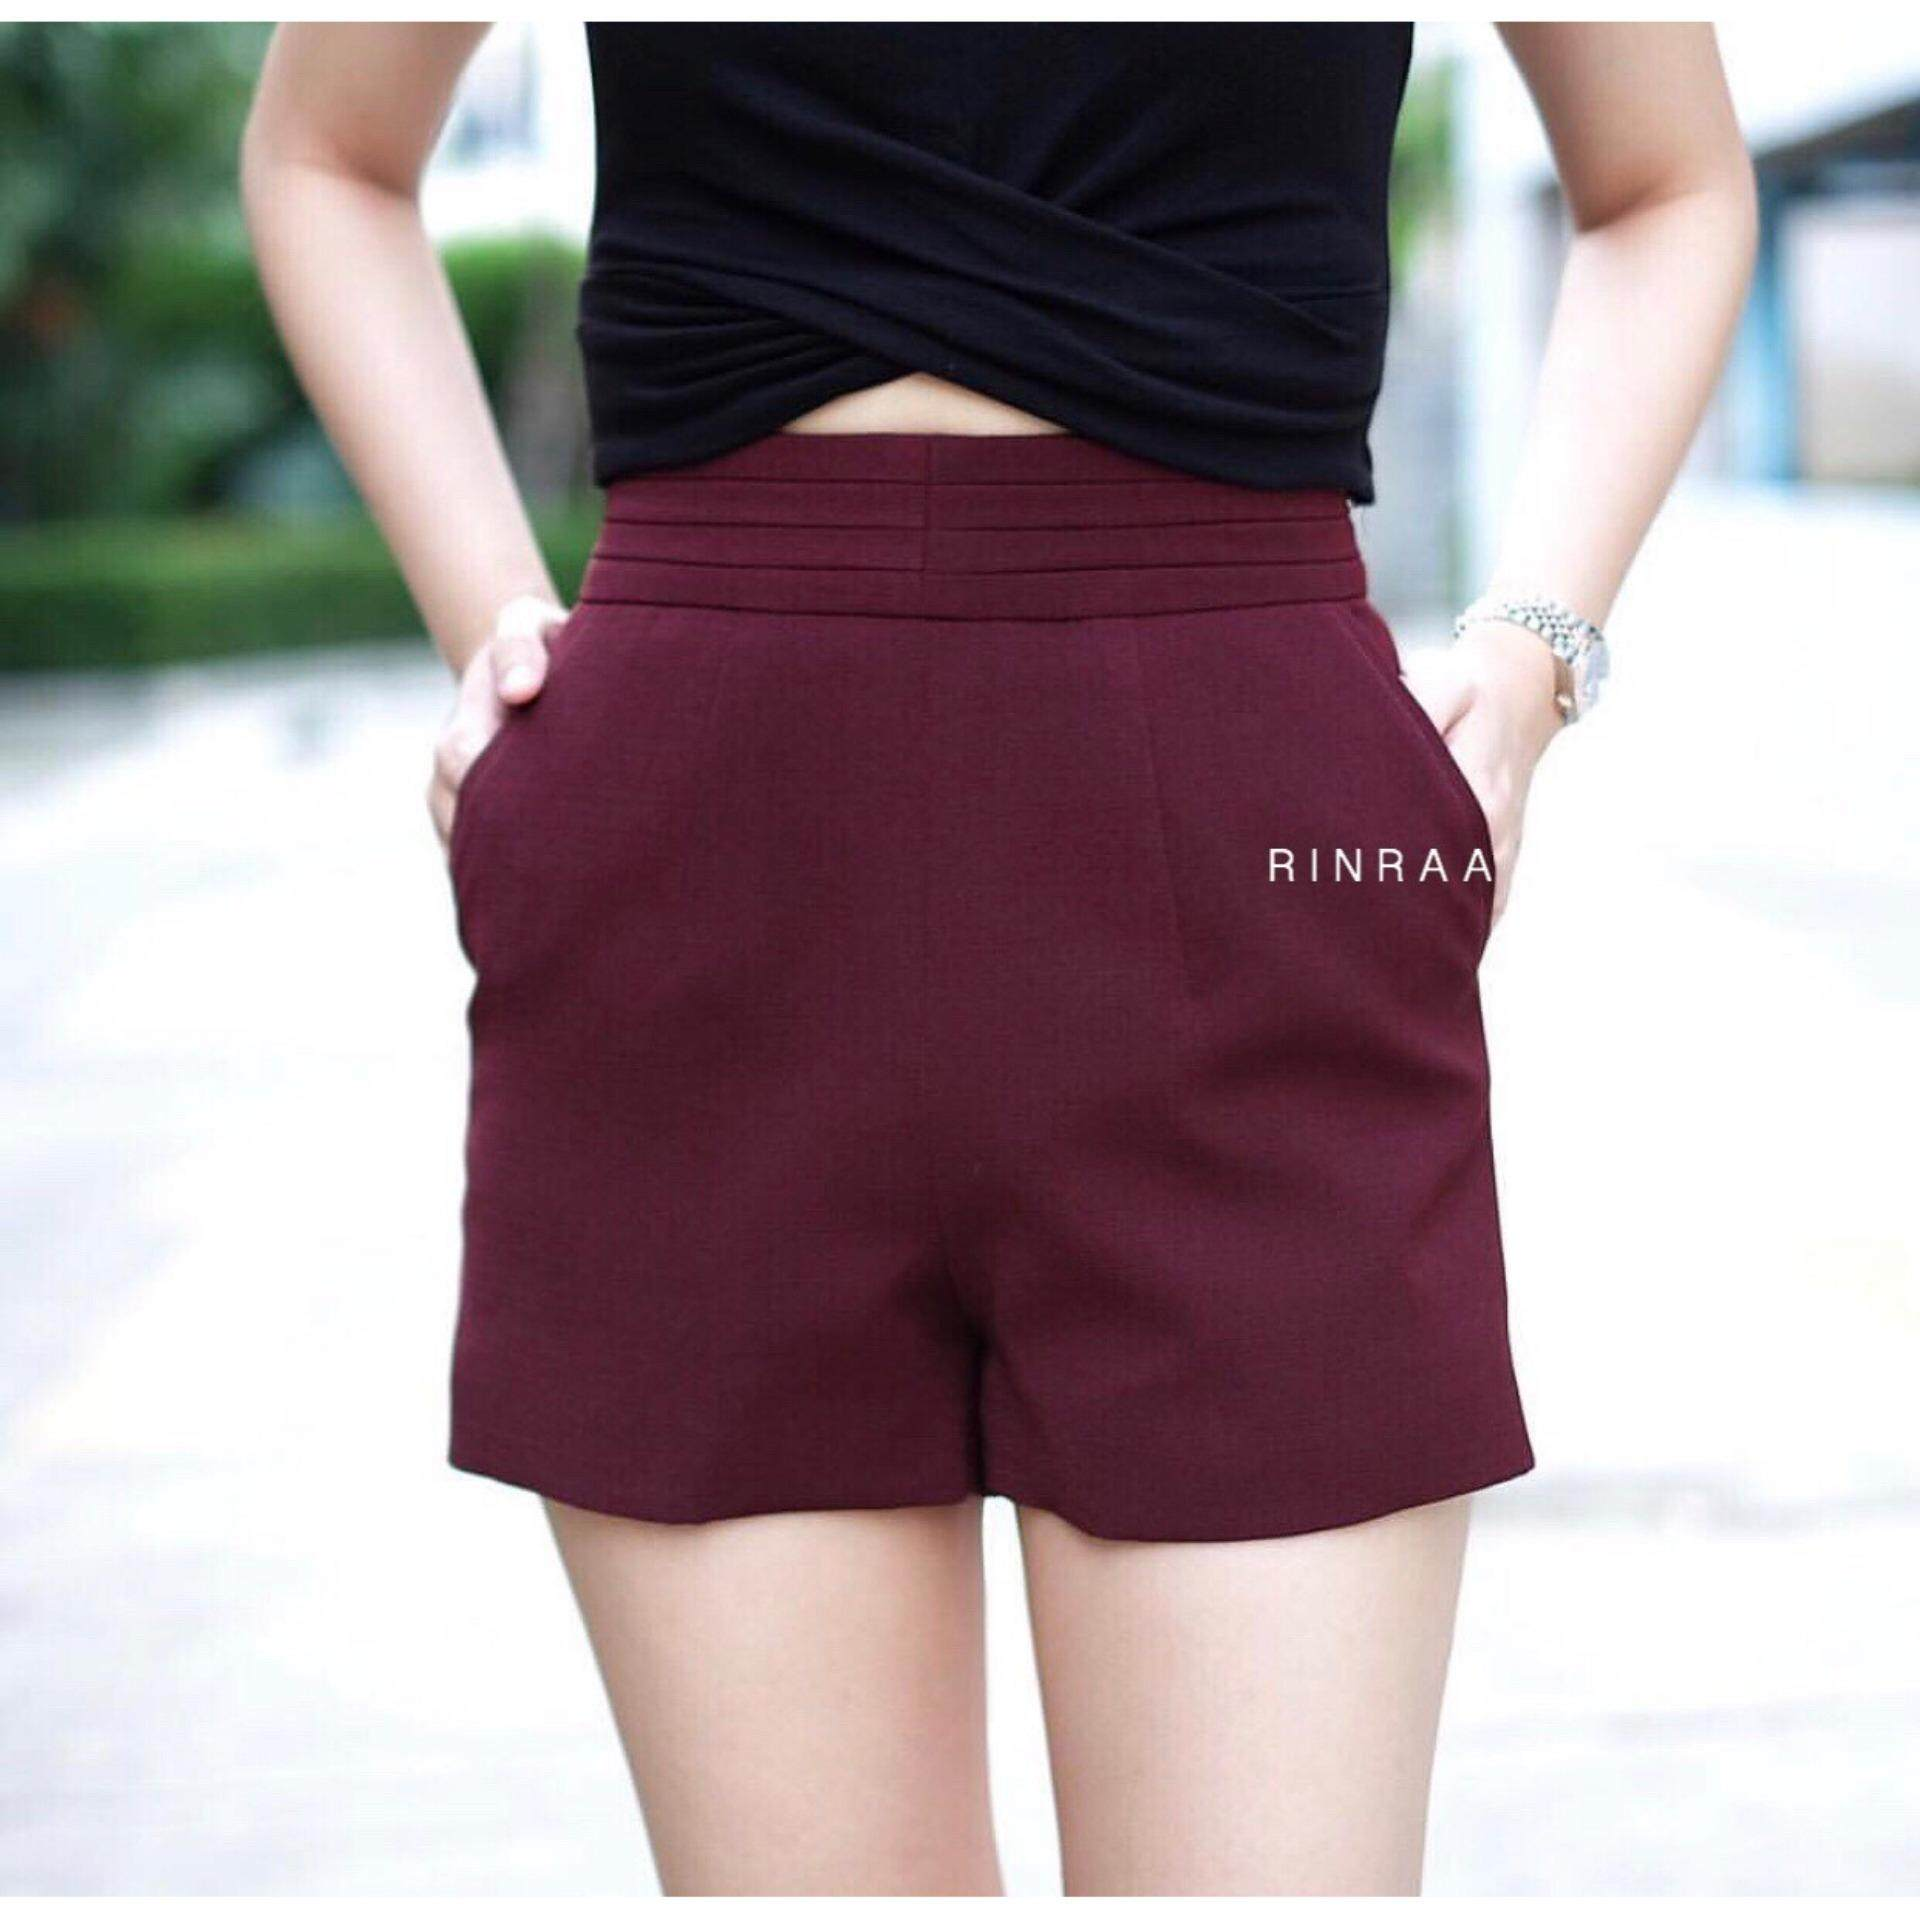 Rinraa Layer Shorts กางเกงขาสั้น